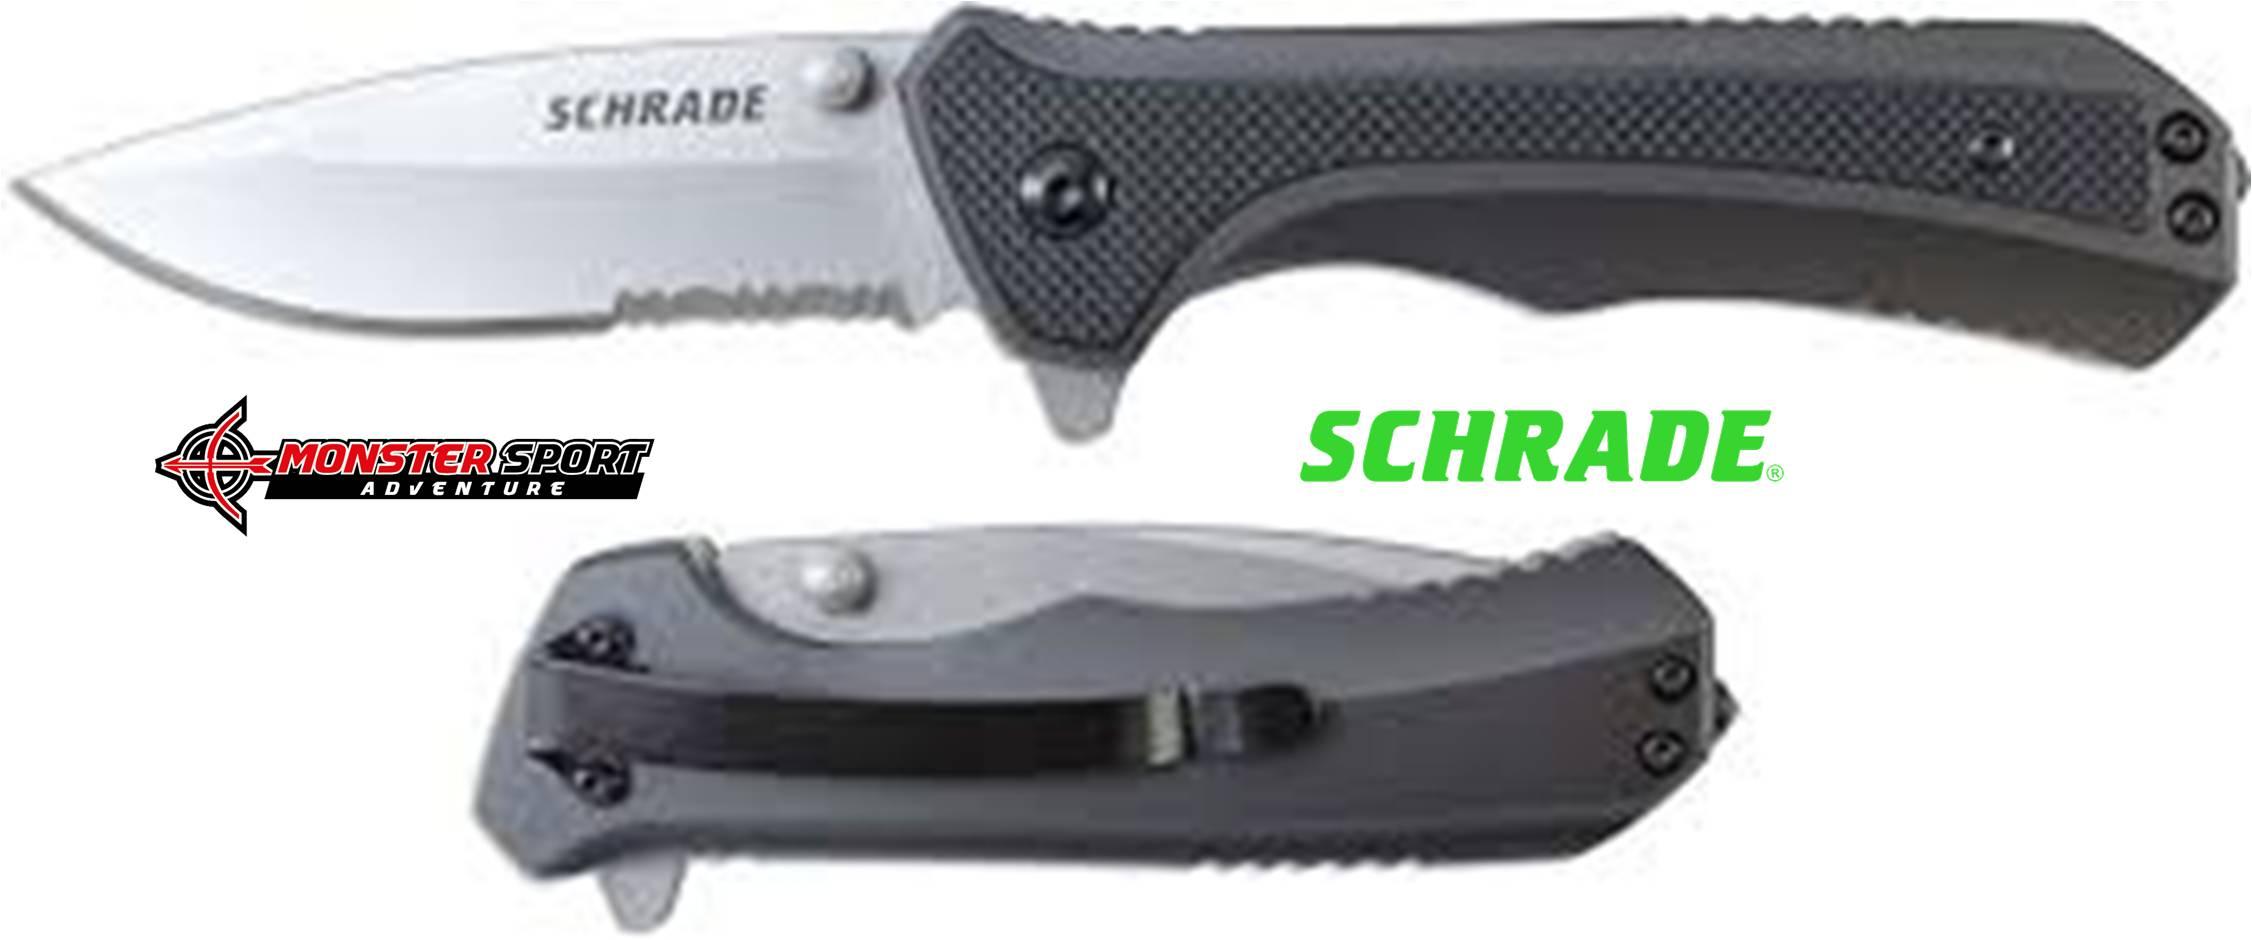 Schrade Tactical Knife Linerlock SCH502S